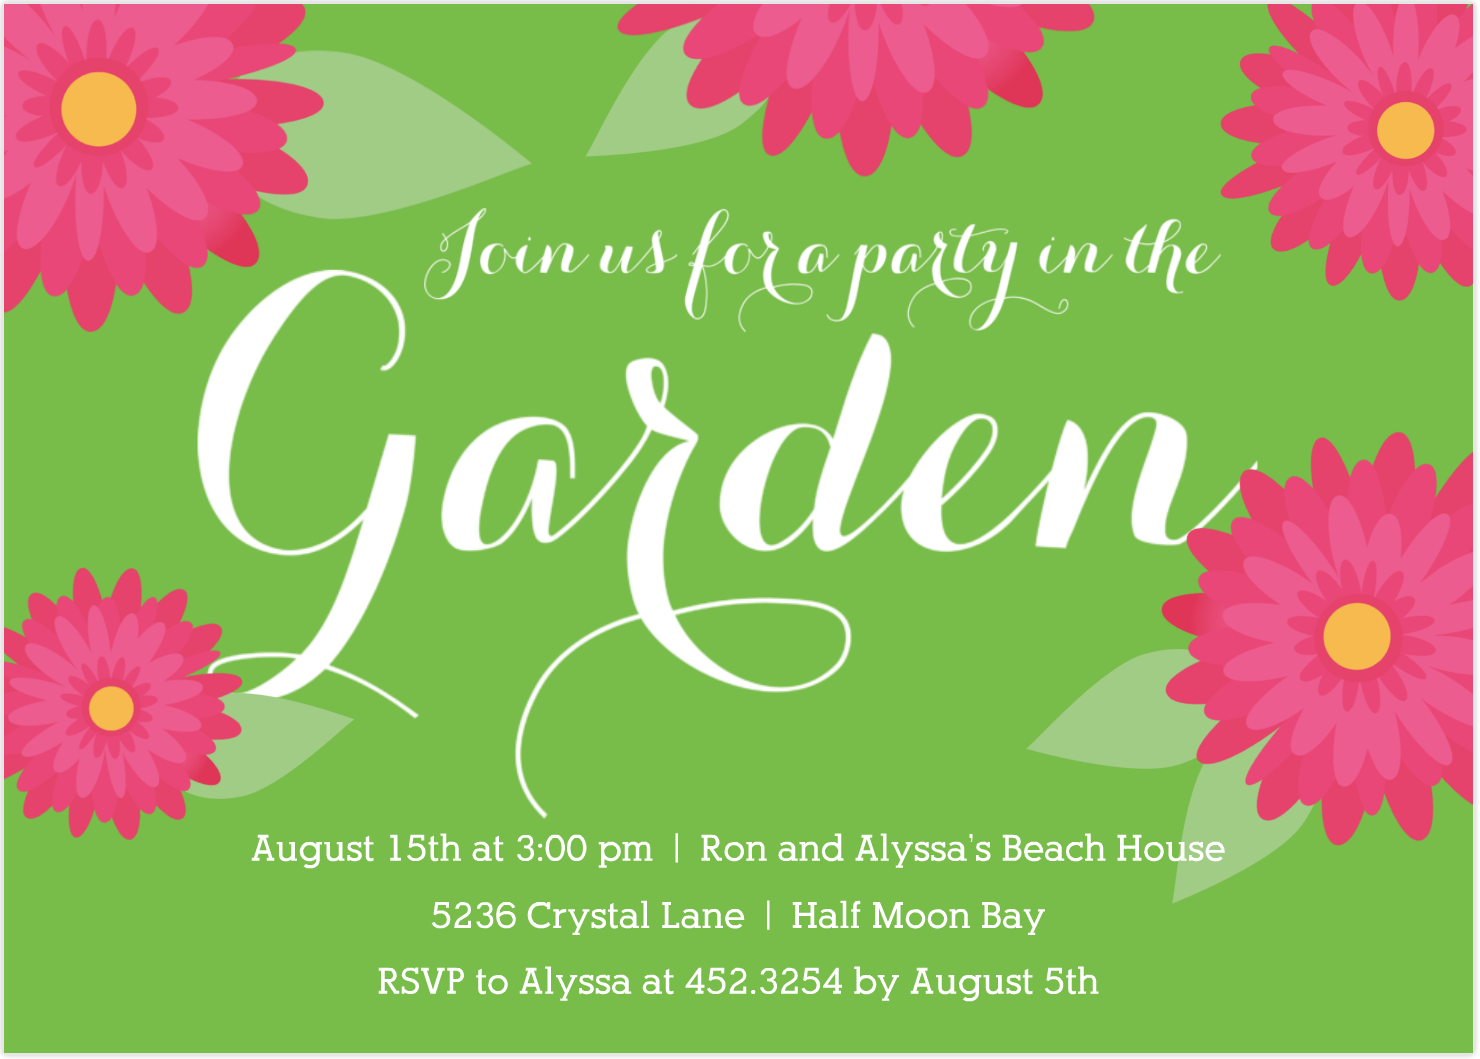 garden party invitation ideas - Romeo.landinez.co